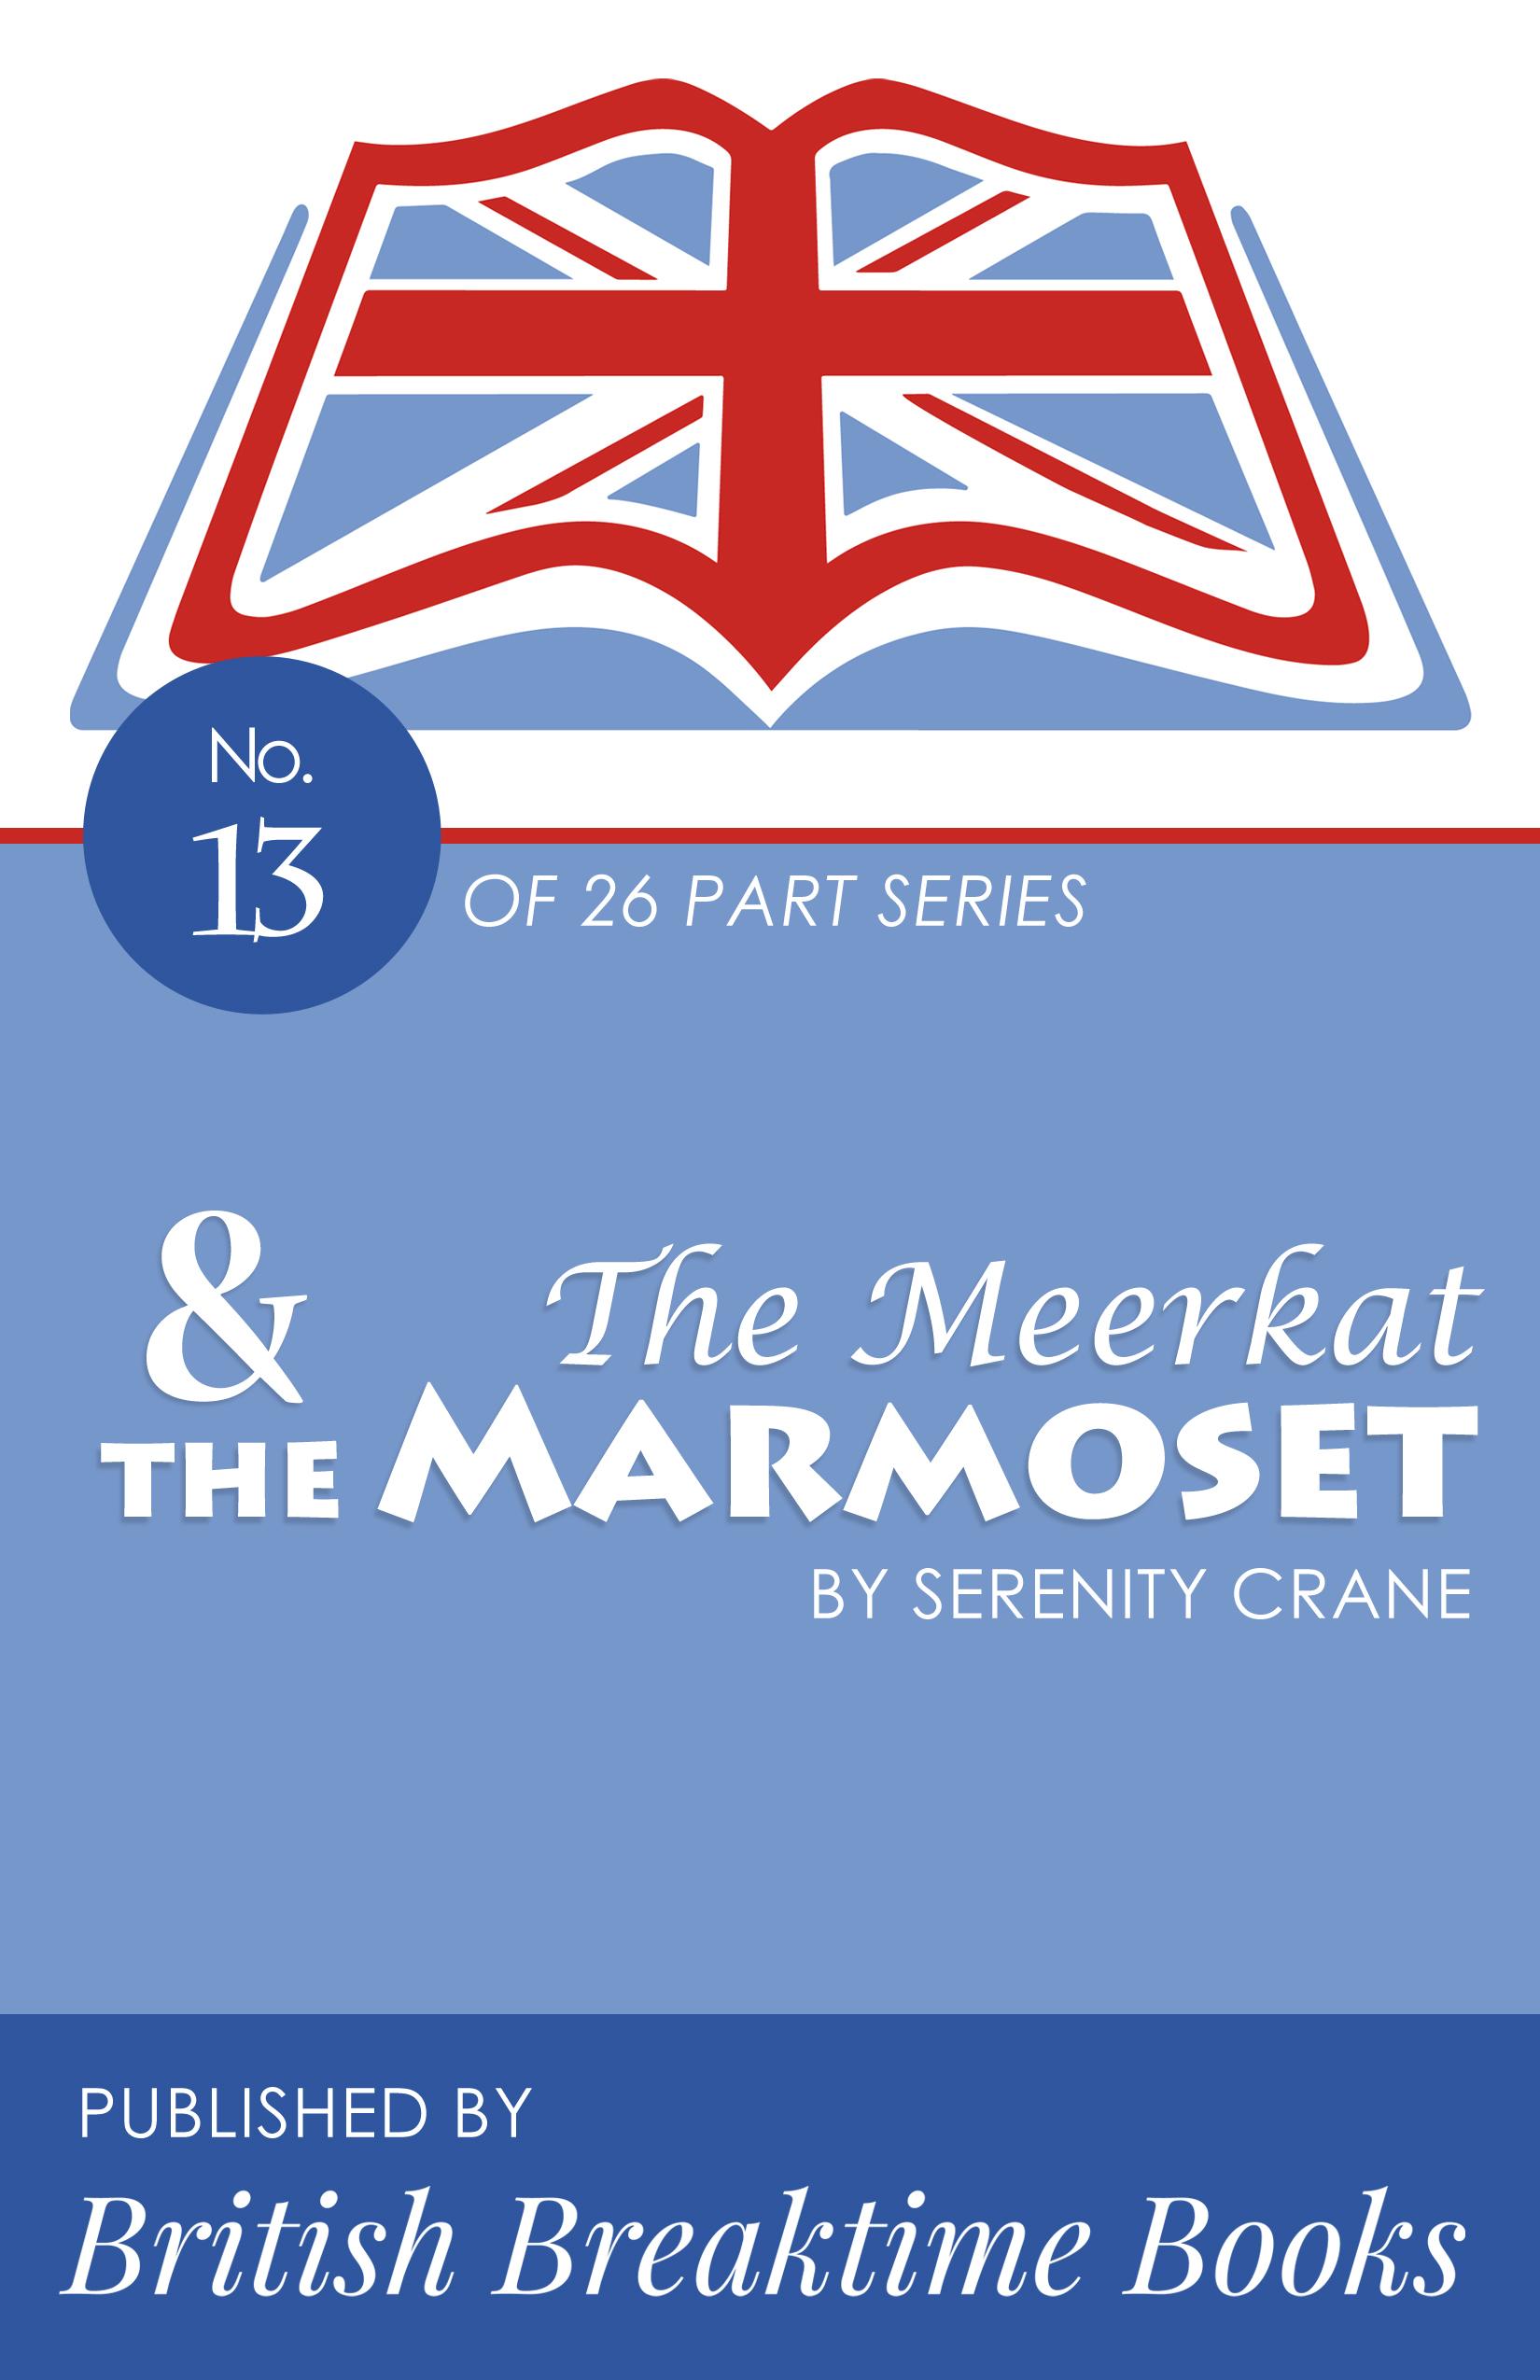 "<span itemprop=""name"">The Meerkat and the Marmoset</span>"